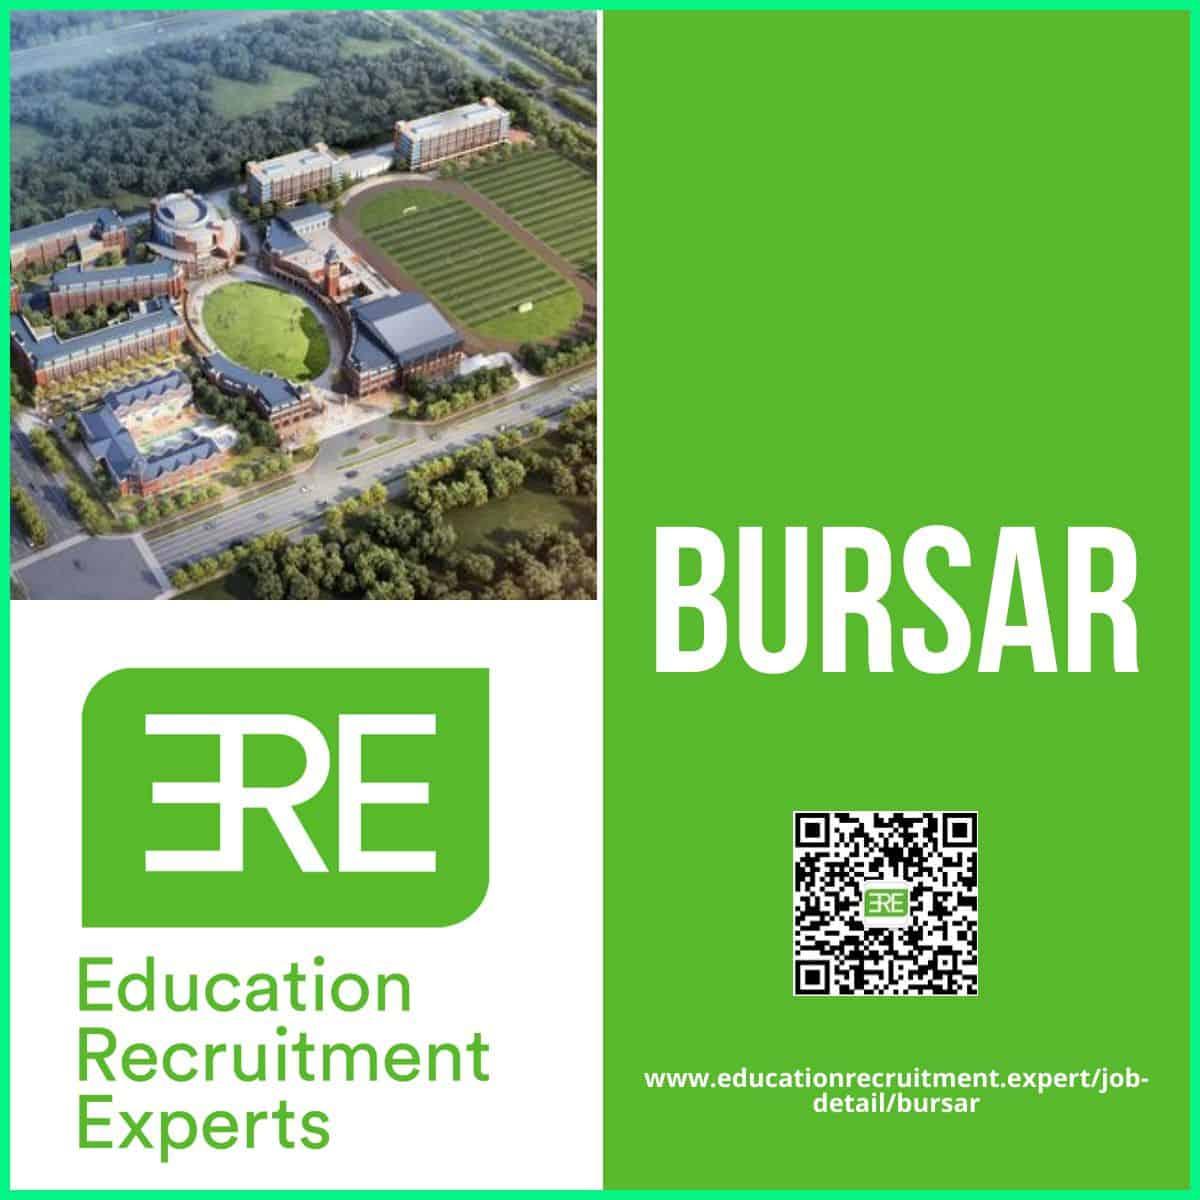 ERE Bursar with WeChat QR code